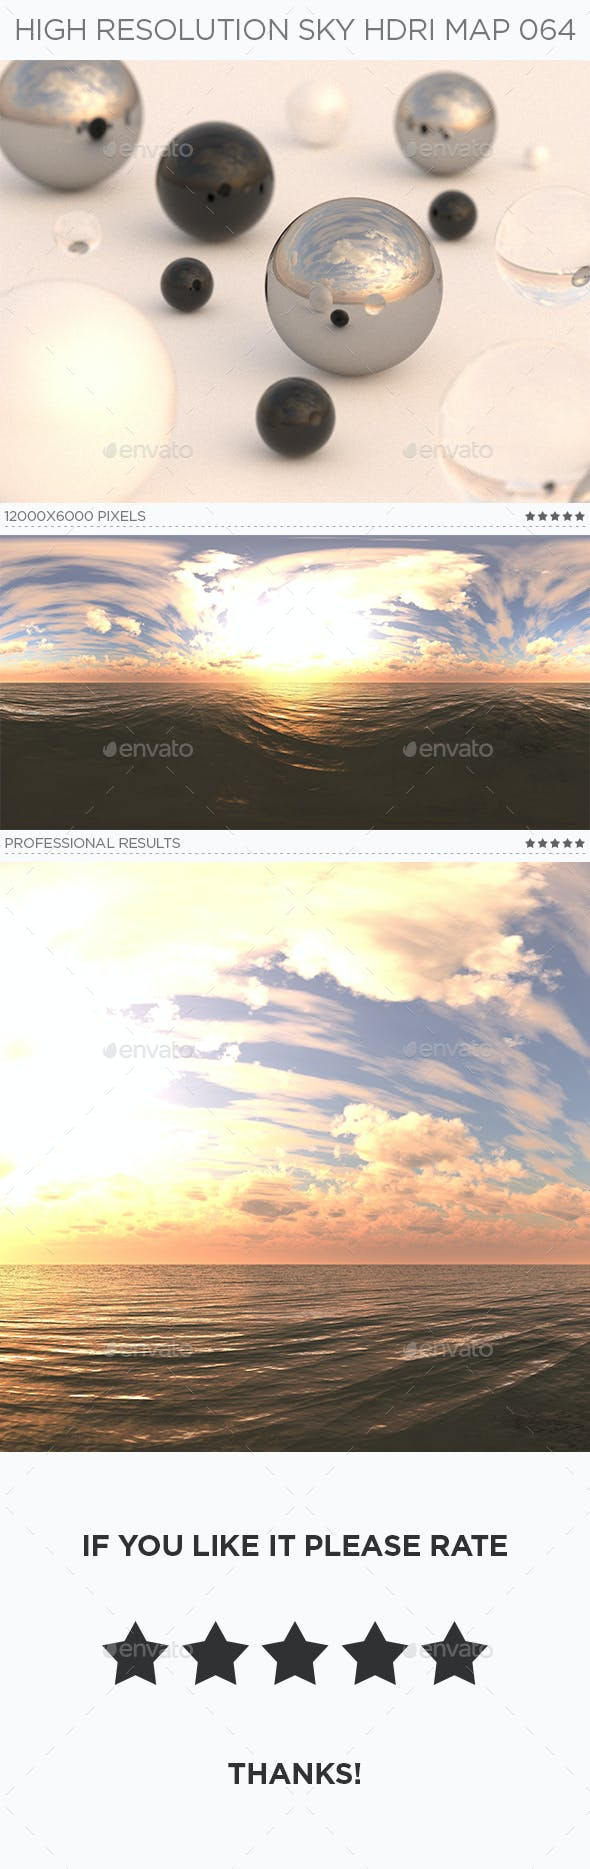 High Resolution Sky HDRi Map 064 - 3DOcean Item for Sale